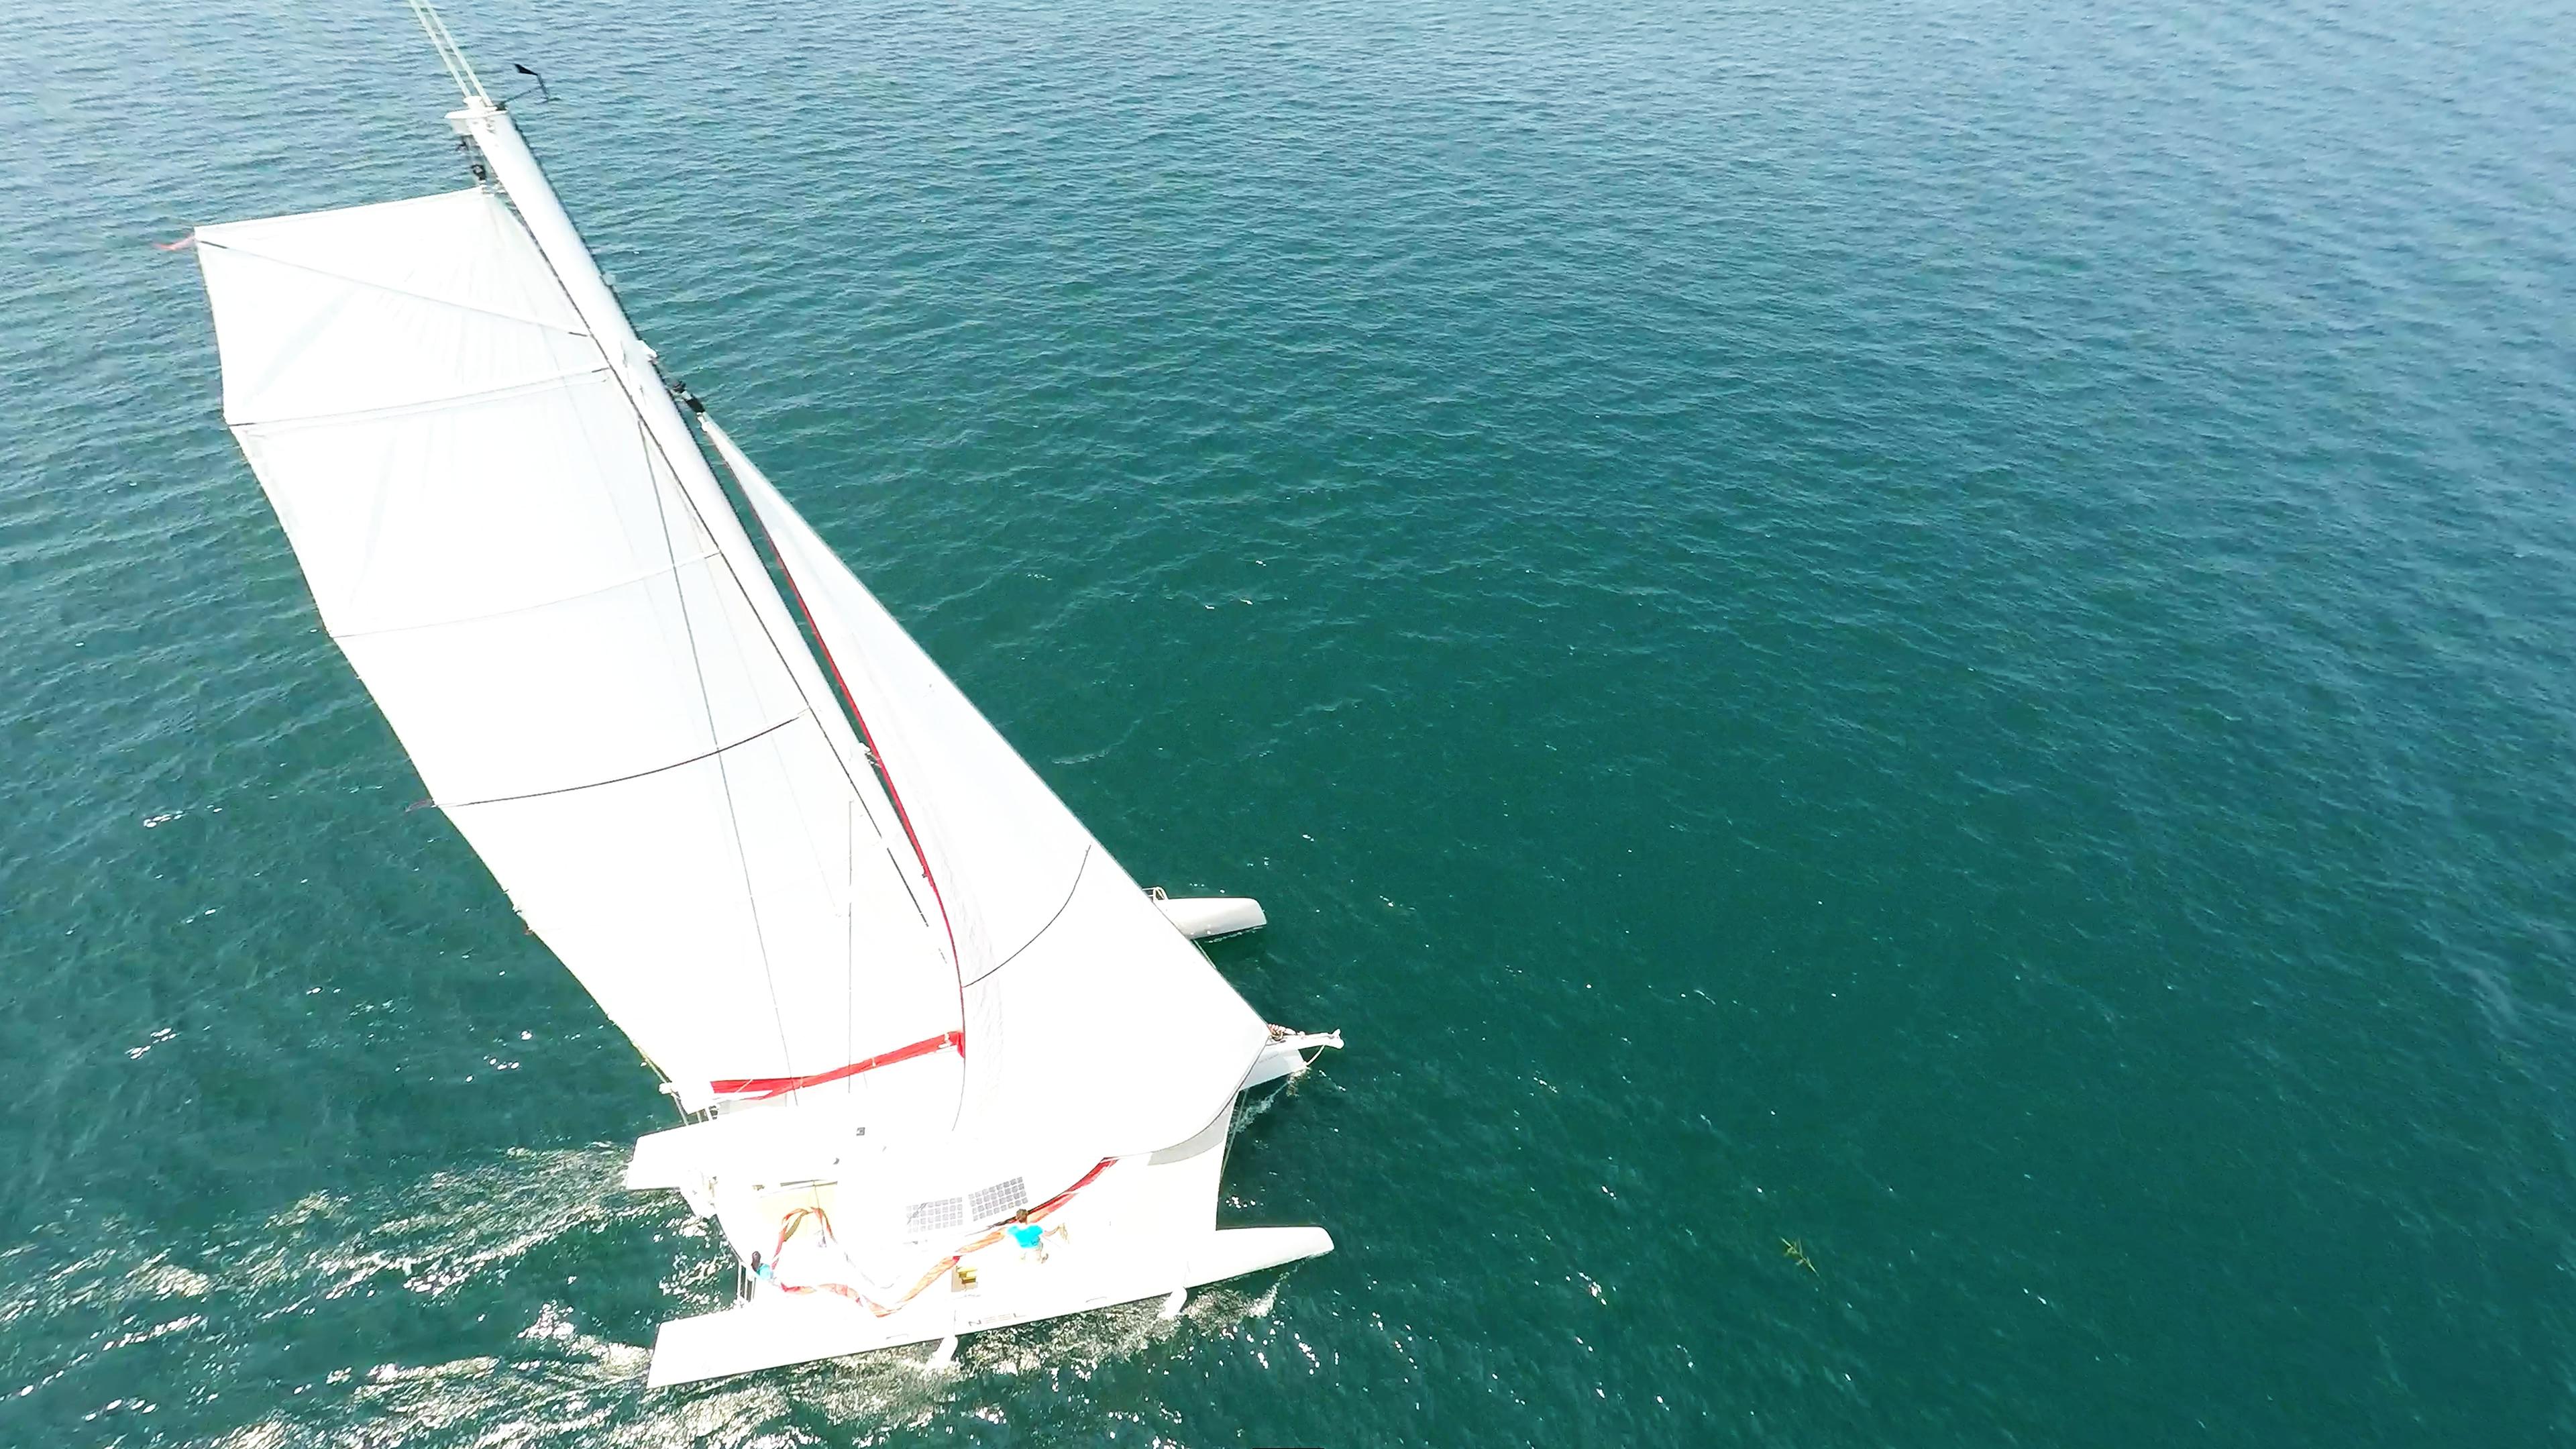 multiscafo yacht naviga a vela appiattita randa